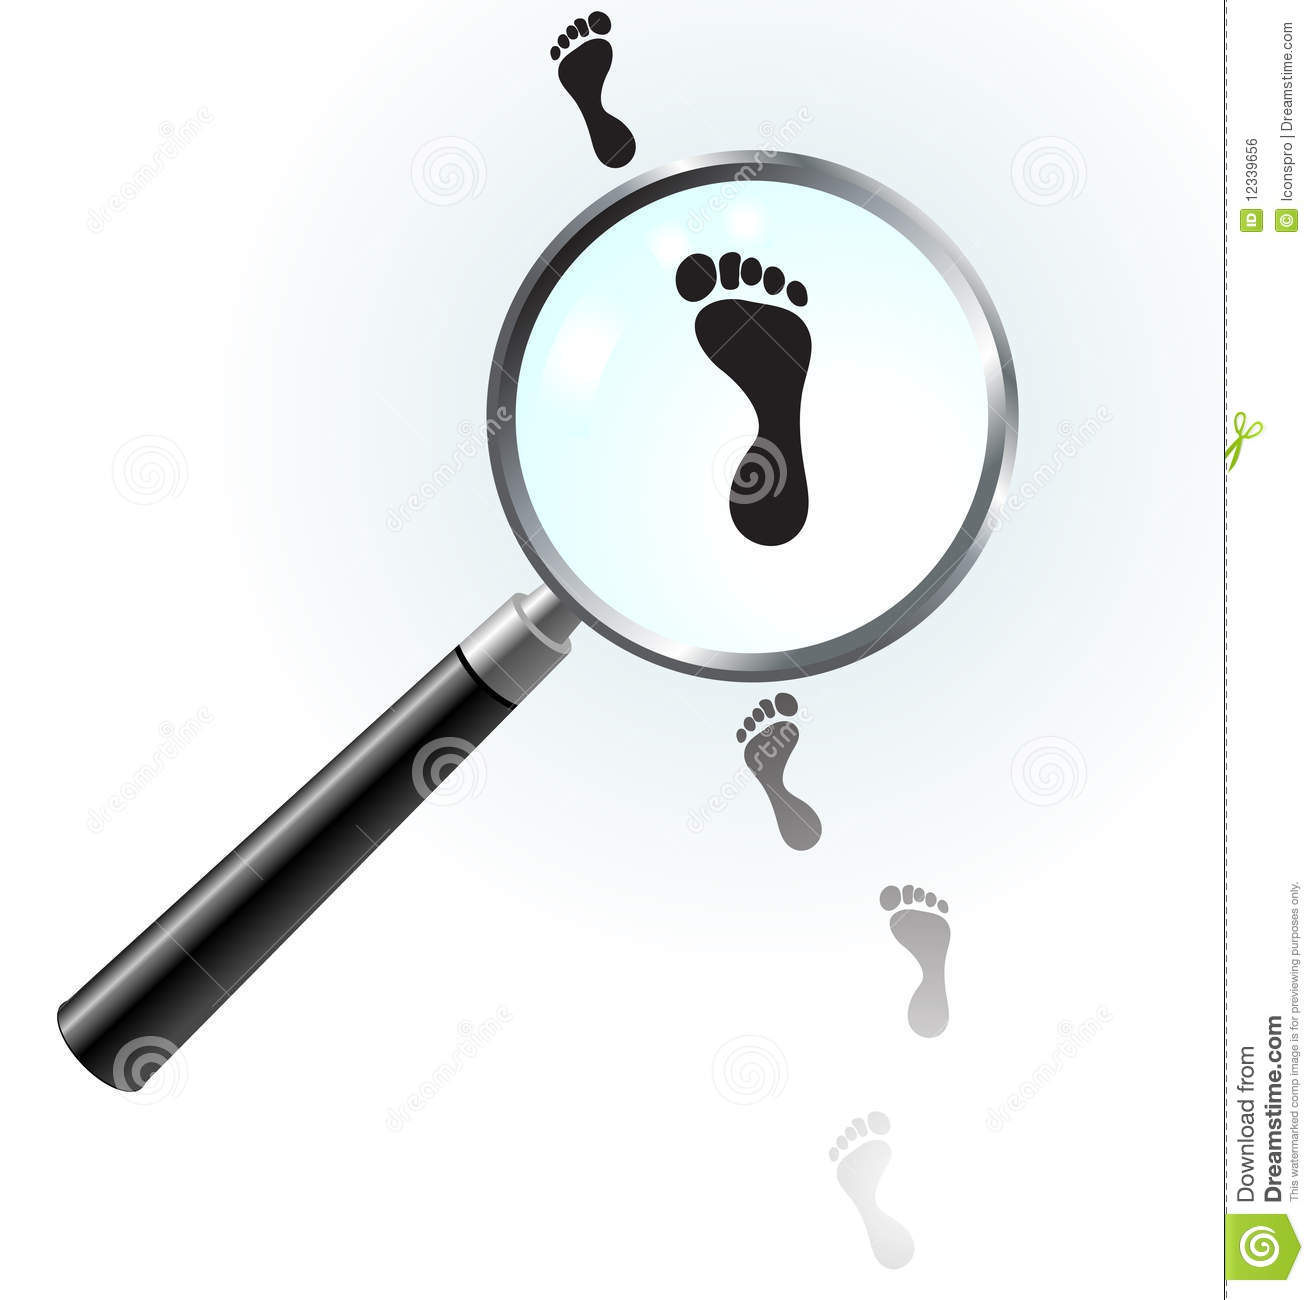 1314x1300 Footprint Clipart Magnifying Glass